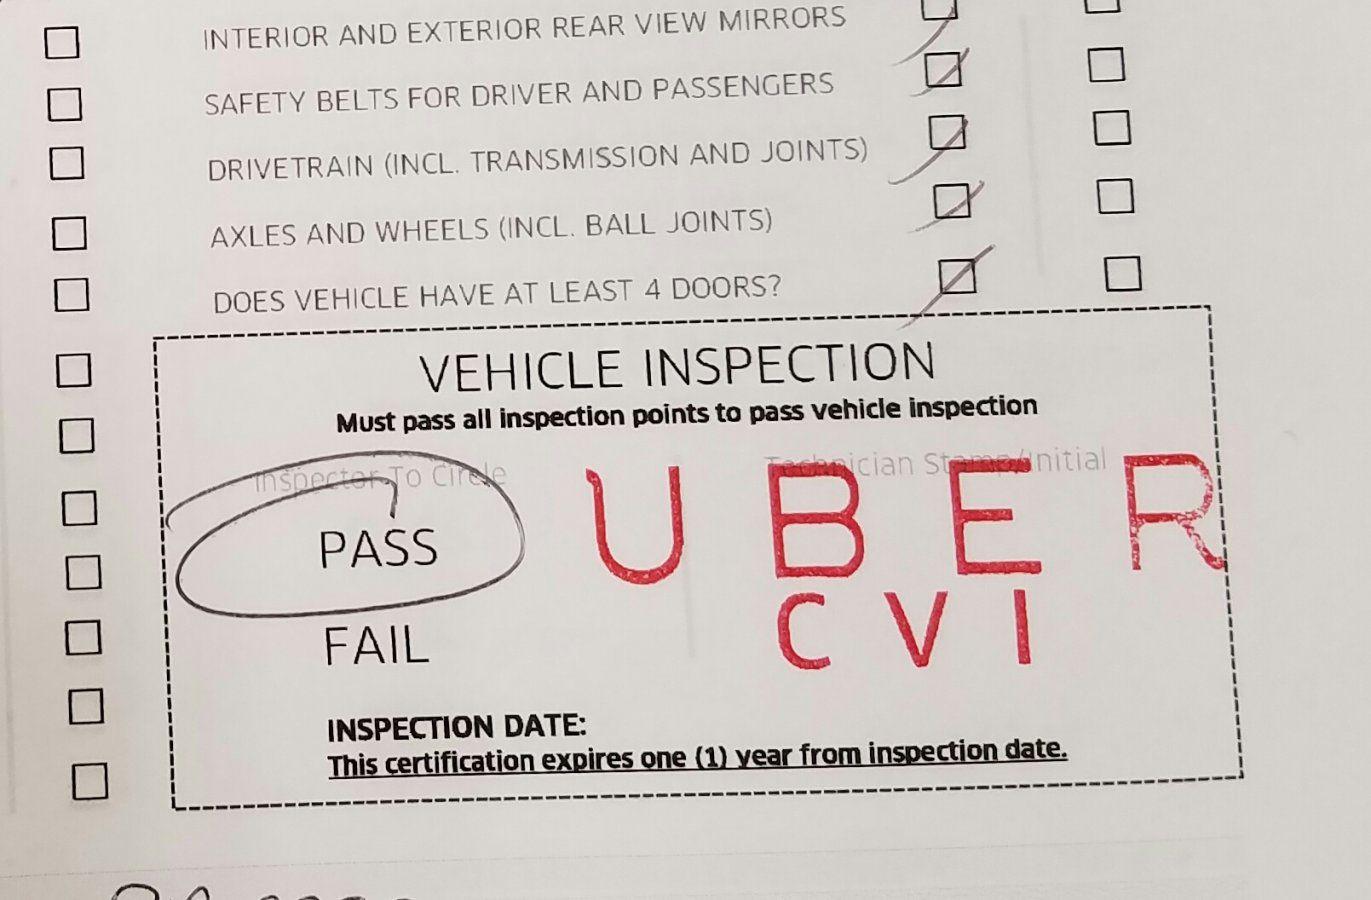 Uber Inspection Cvi Stamp Uber Drivers Forum